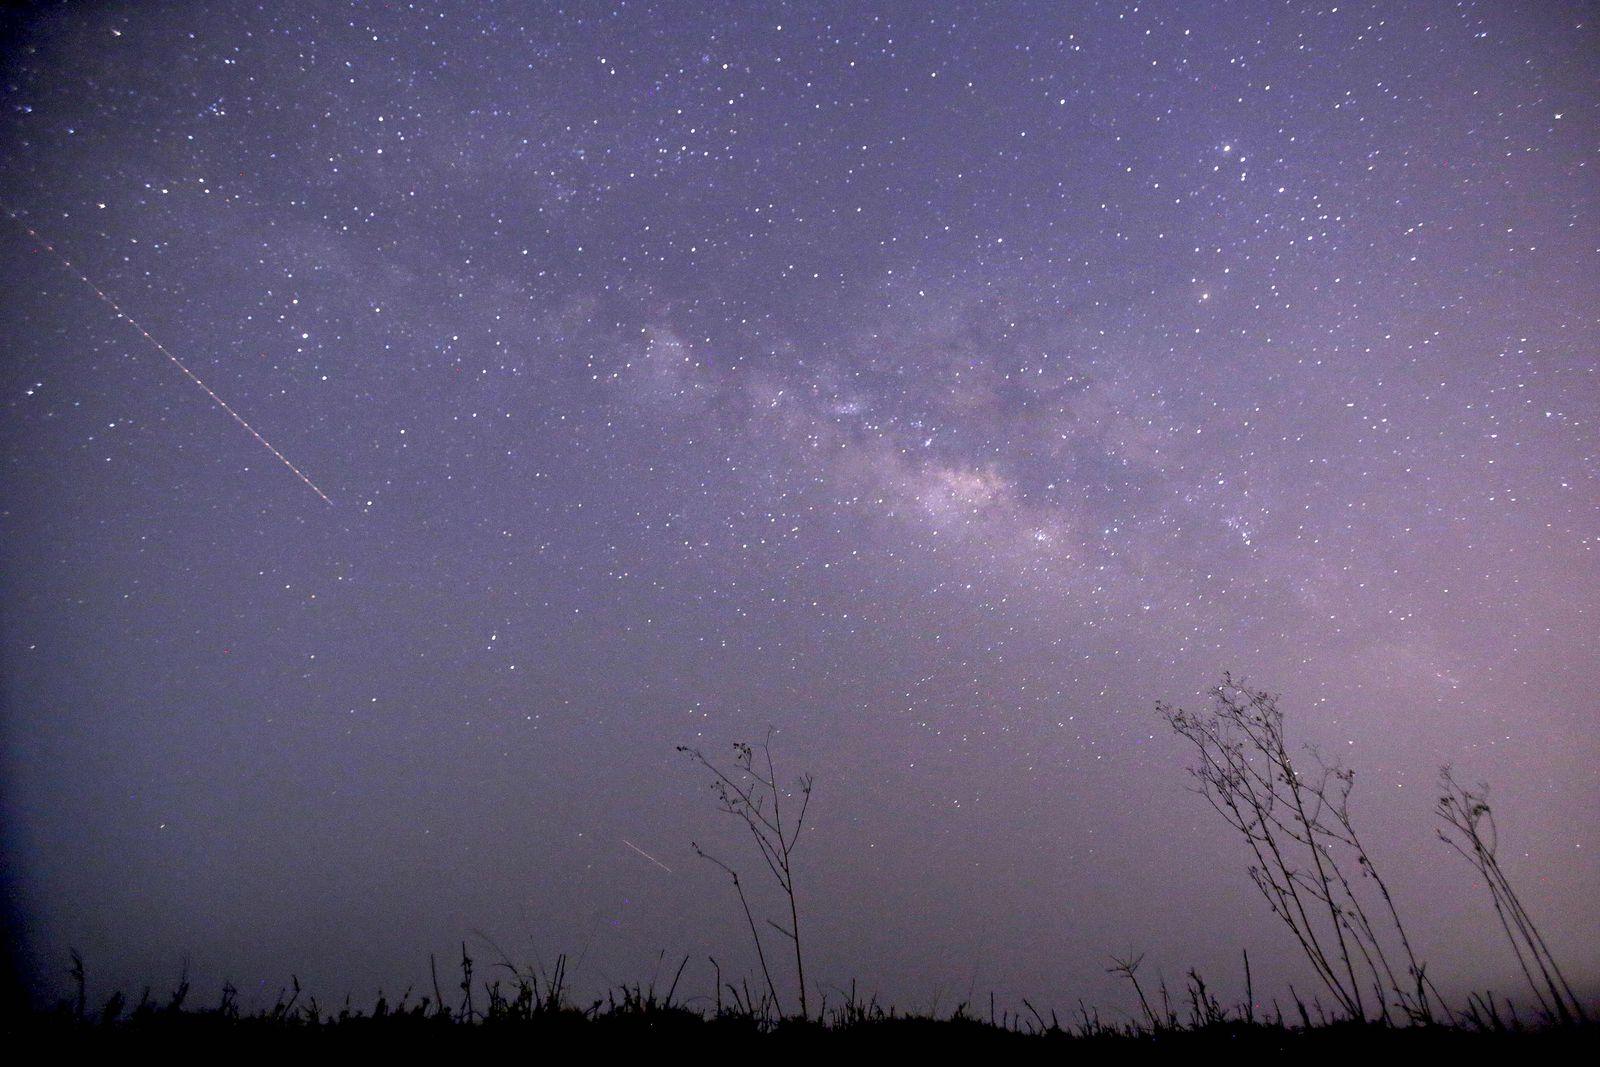 MYANMAR-ASTRONOMY-METEOR-SHOWER-LYRIDS